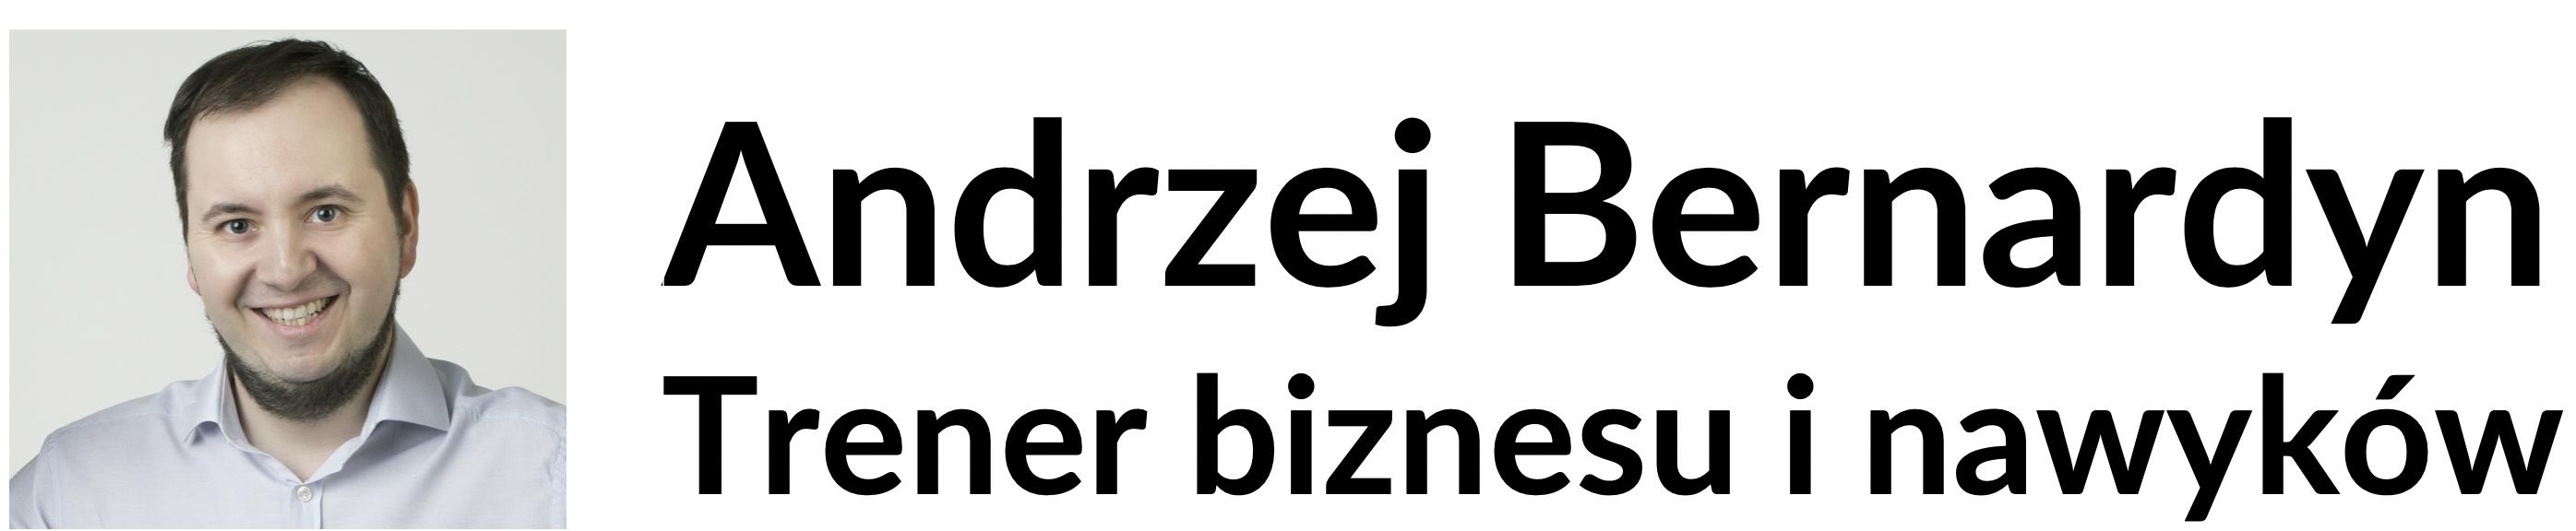 Andrzej Bernardyn